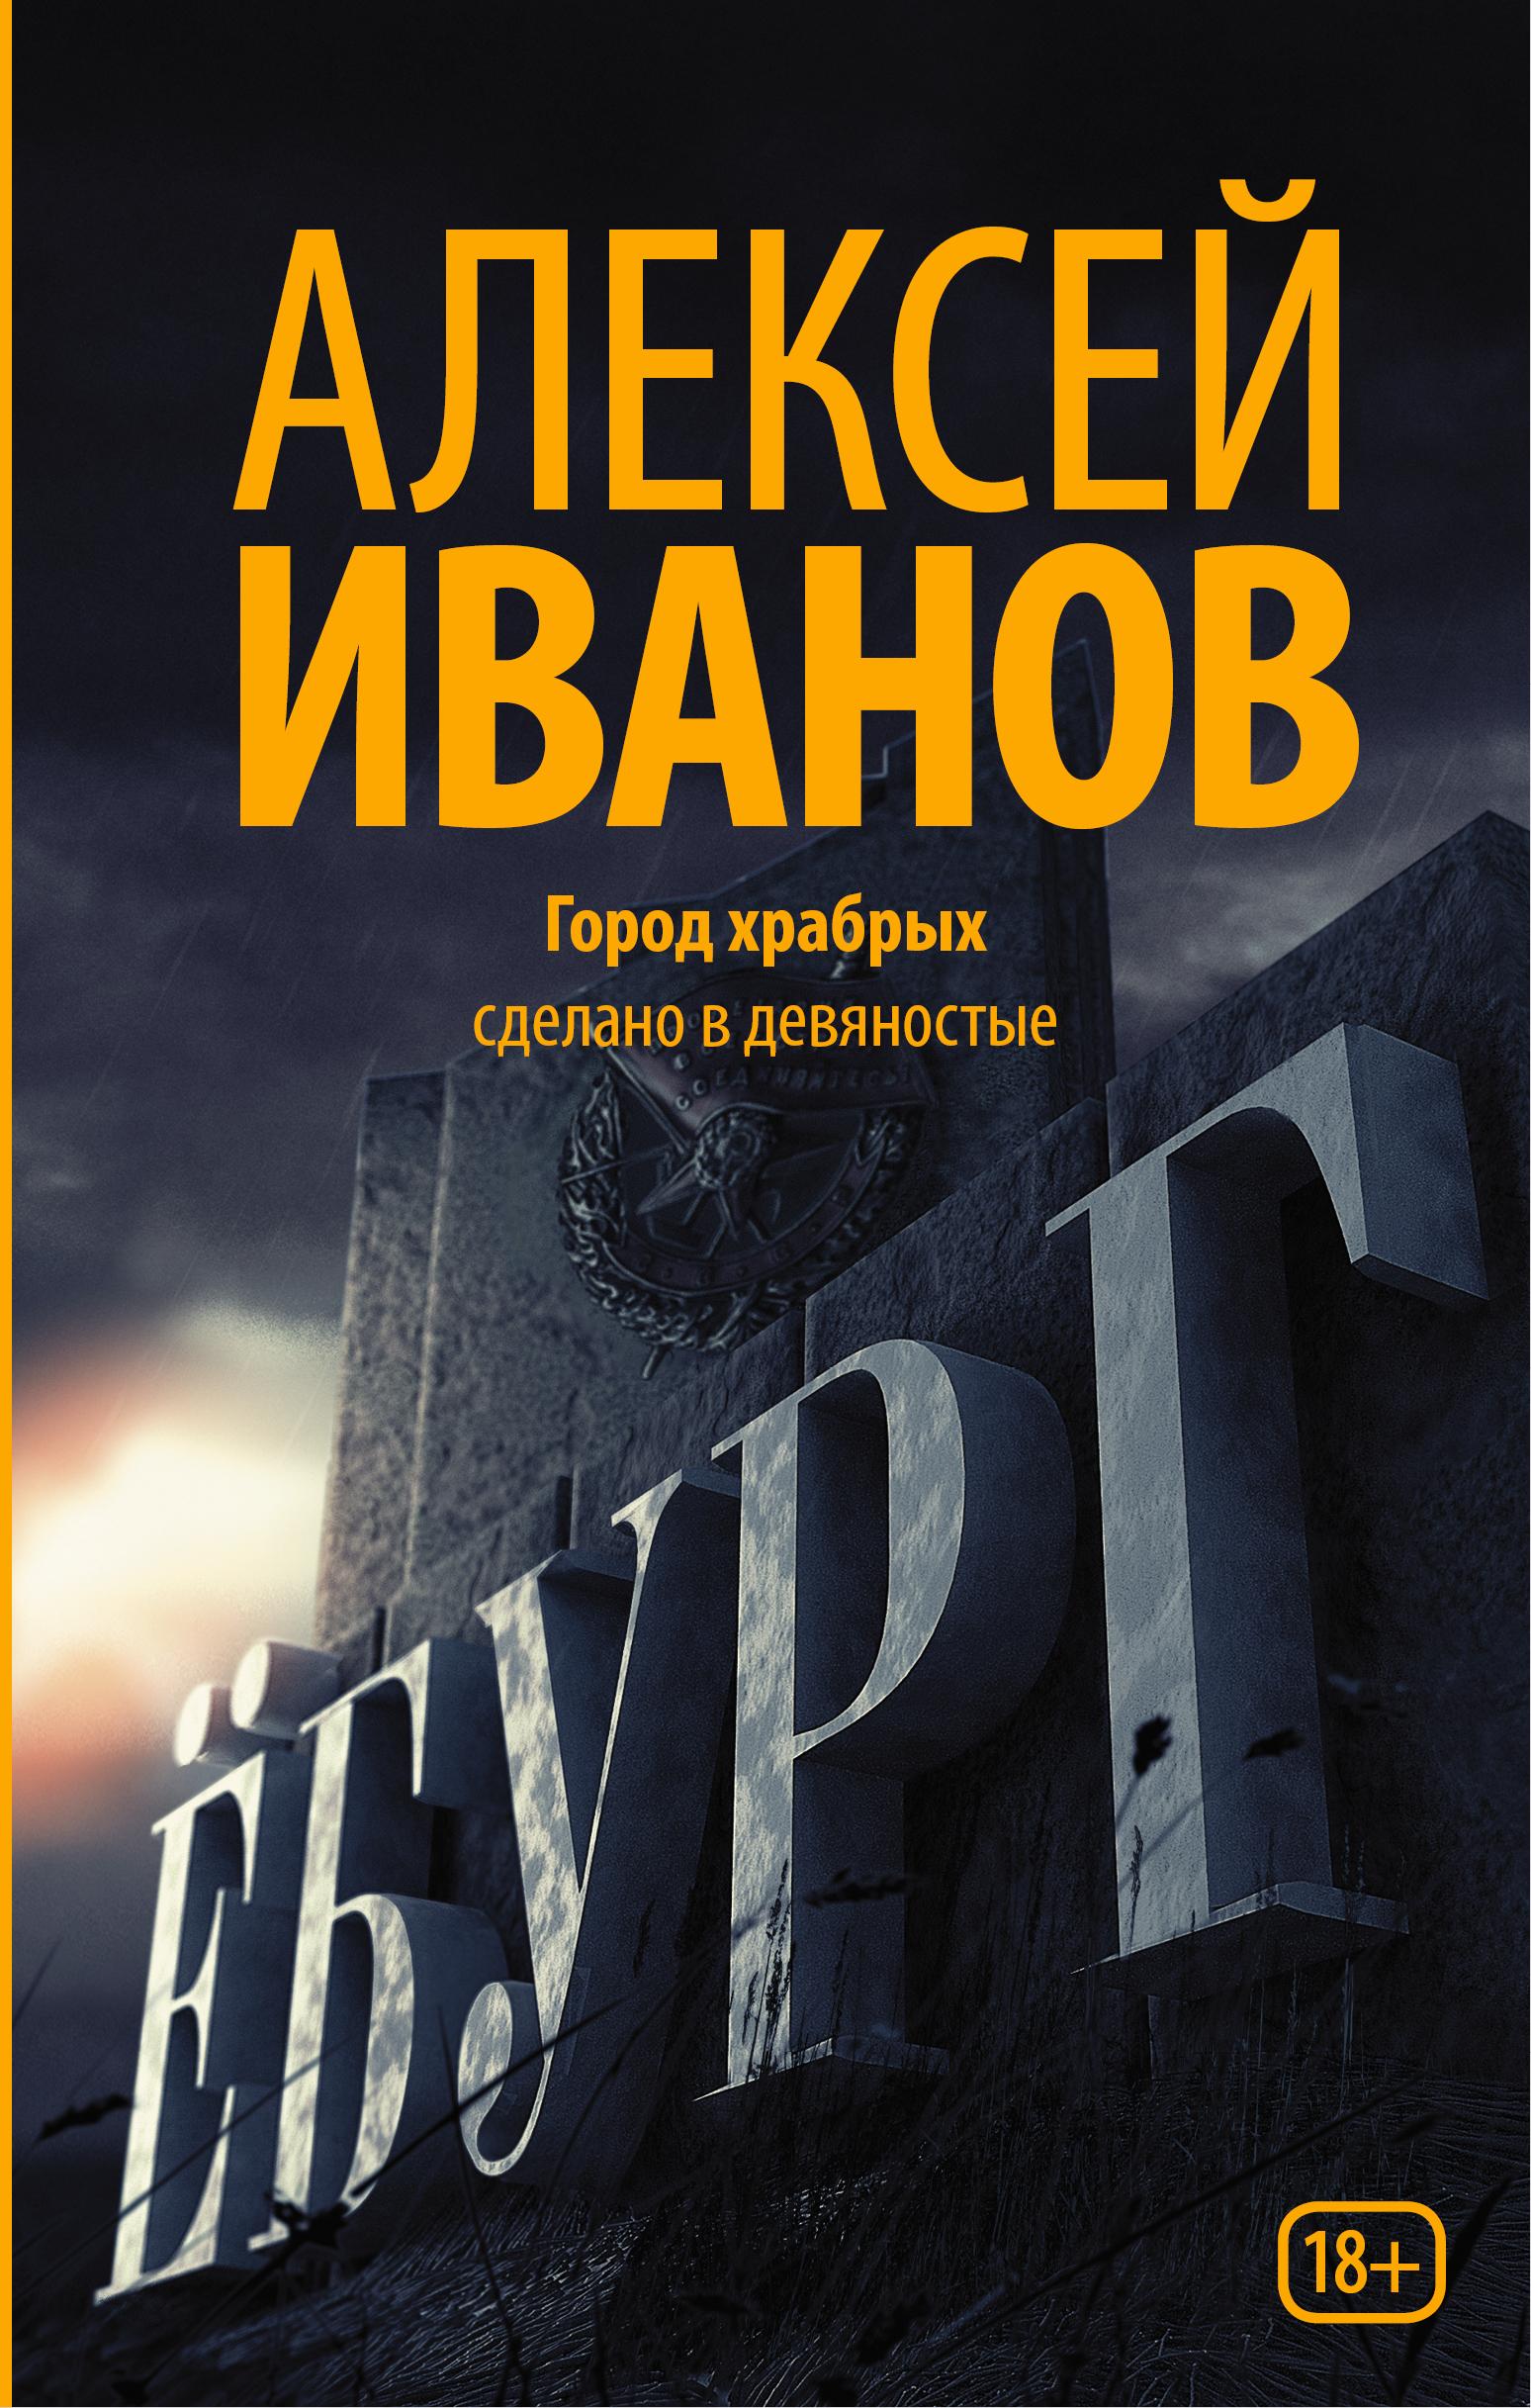 Иванов А.В. Ёбург ISBN: 978-5-17-094309-8 алексей иванов ёбург isbn 978 5 17 094309 8